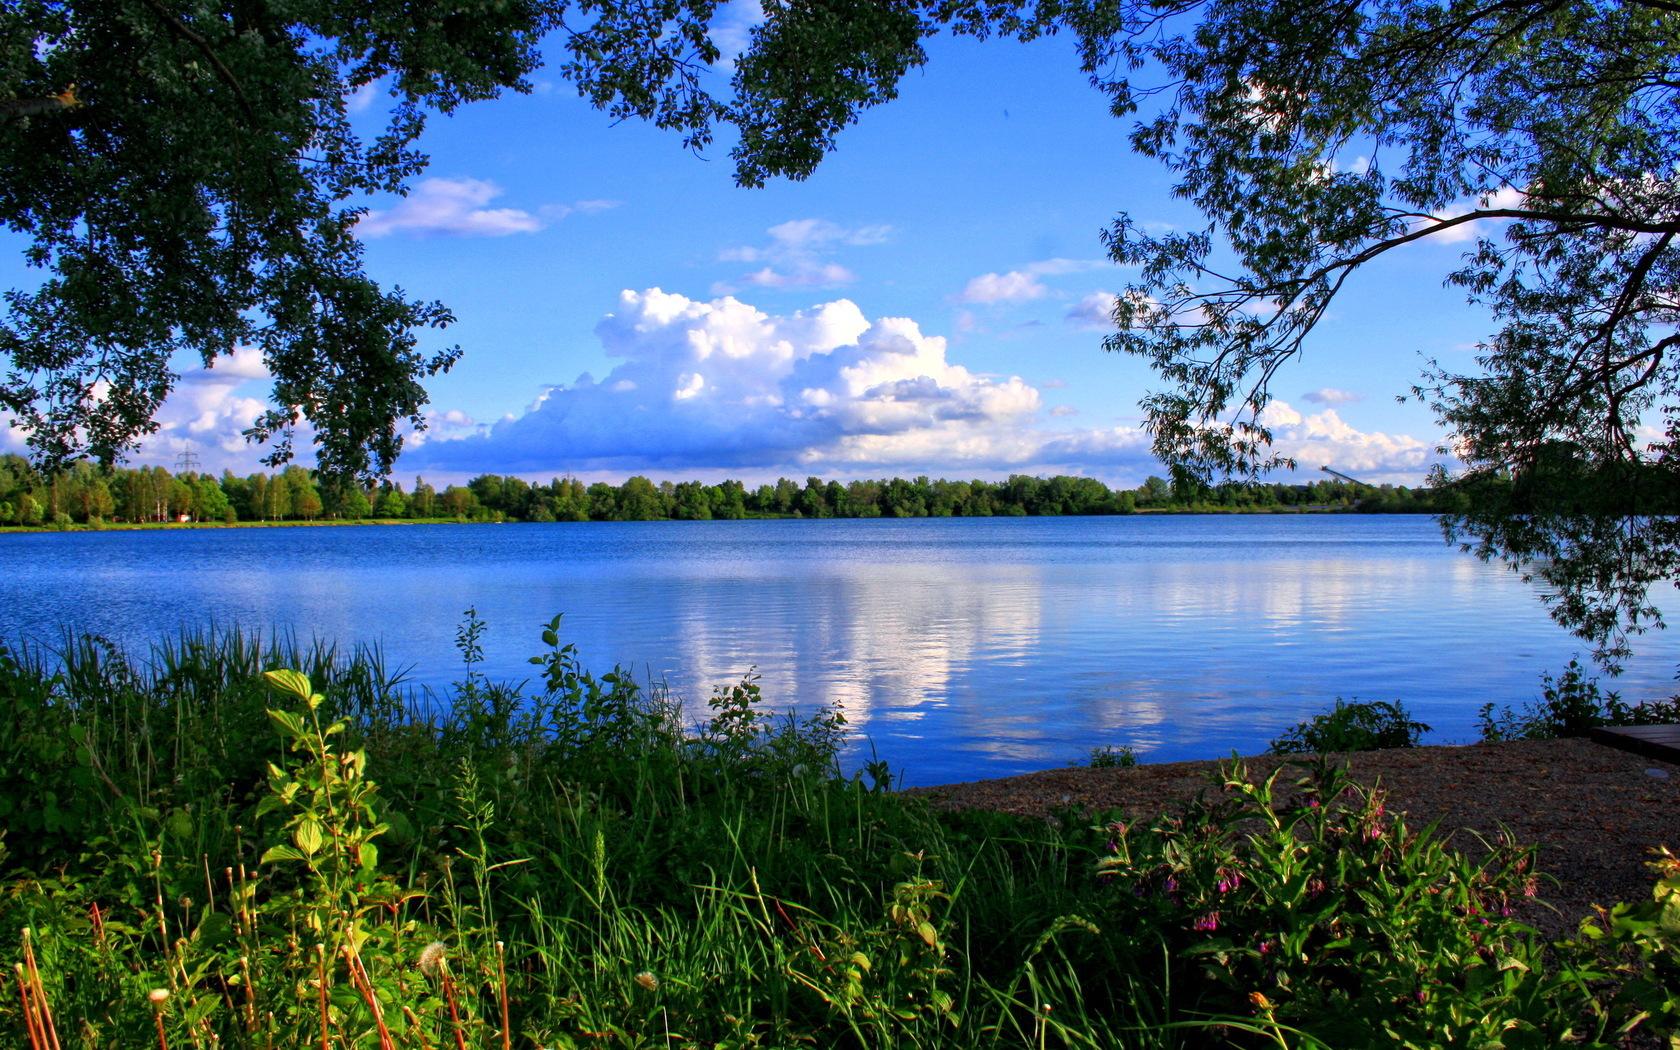 Природа пейзаж реки озера река